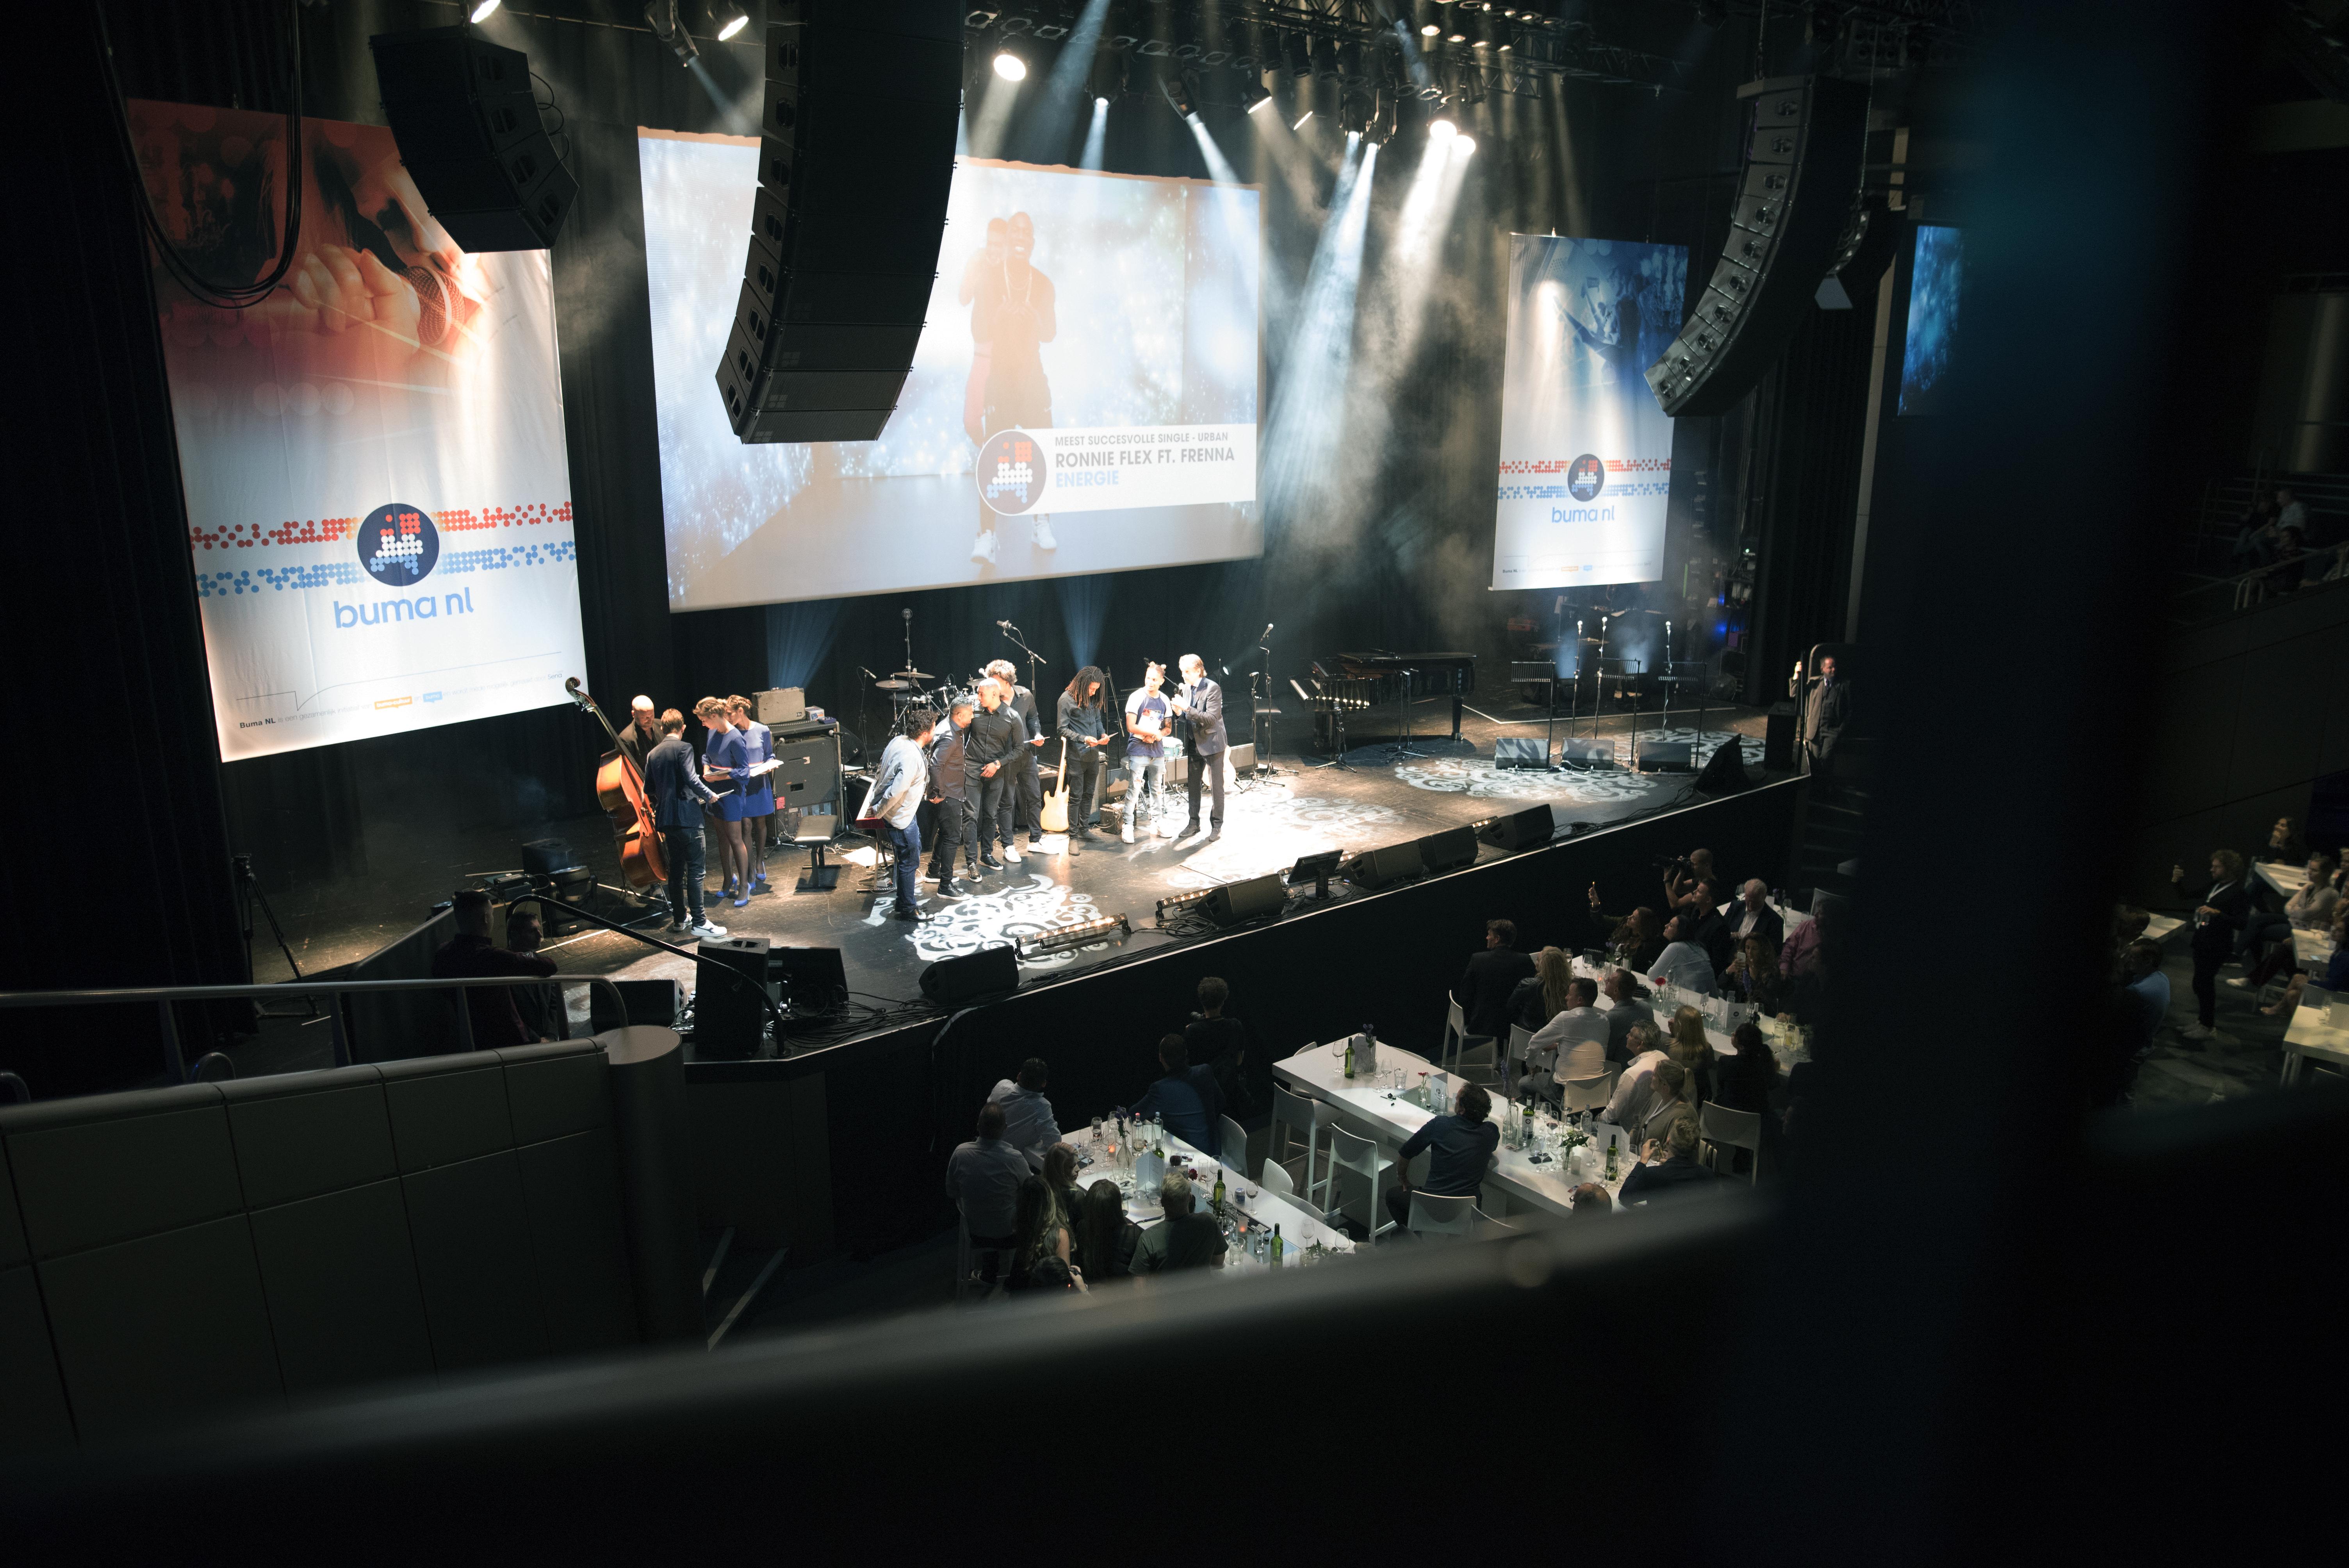 Ronnie Flex en Frenna tijdens Buma NL Awards 2017 - Fotocredits: Shali Blok (ArtiestenNieuws)